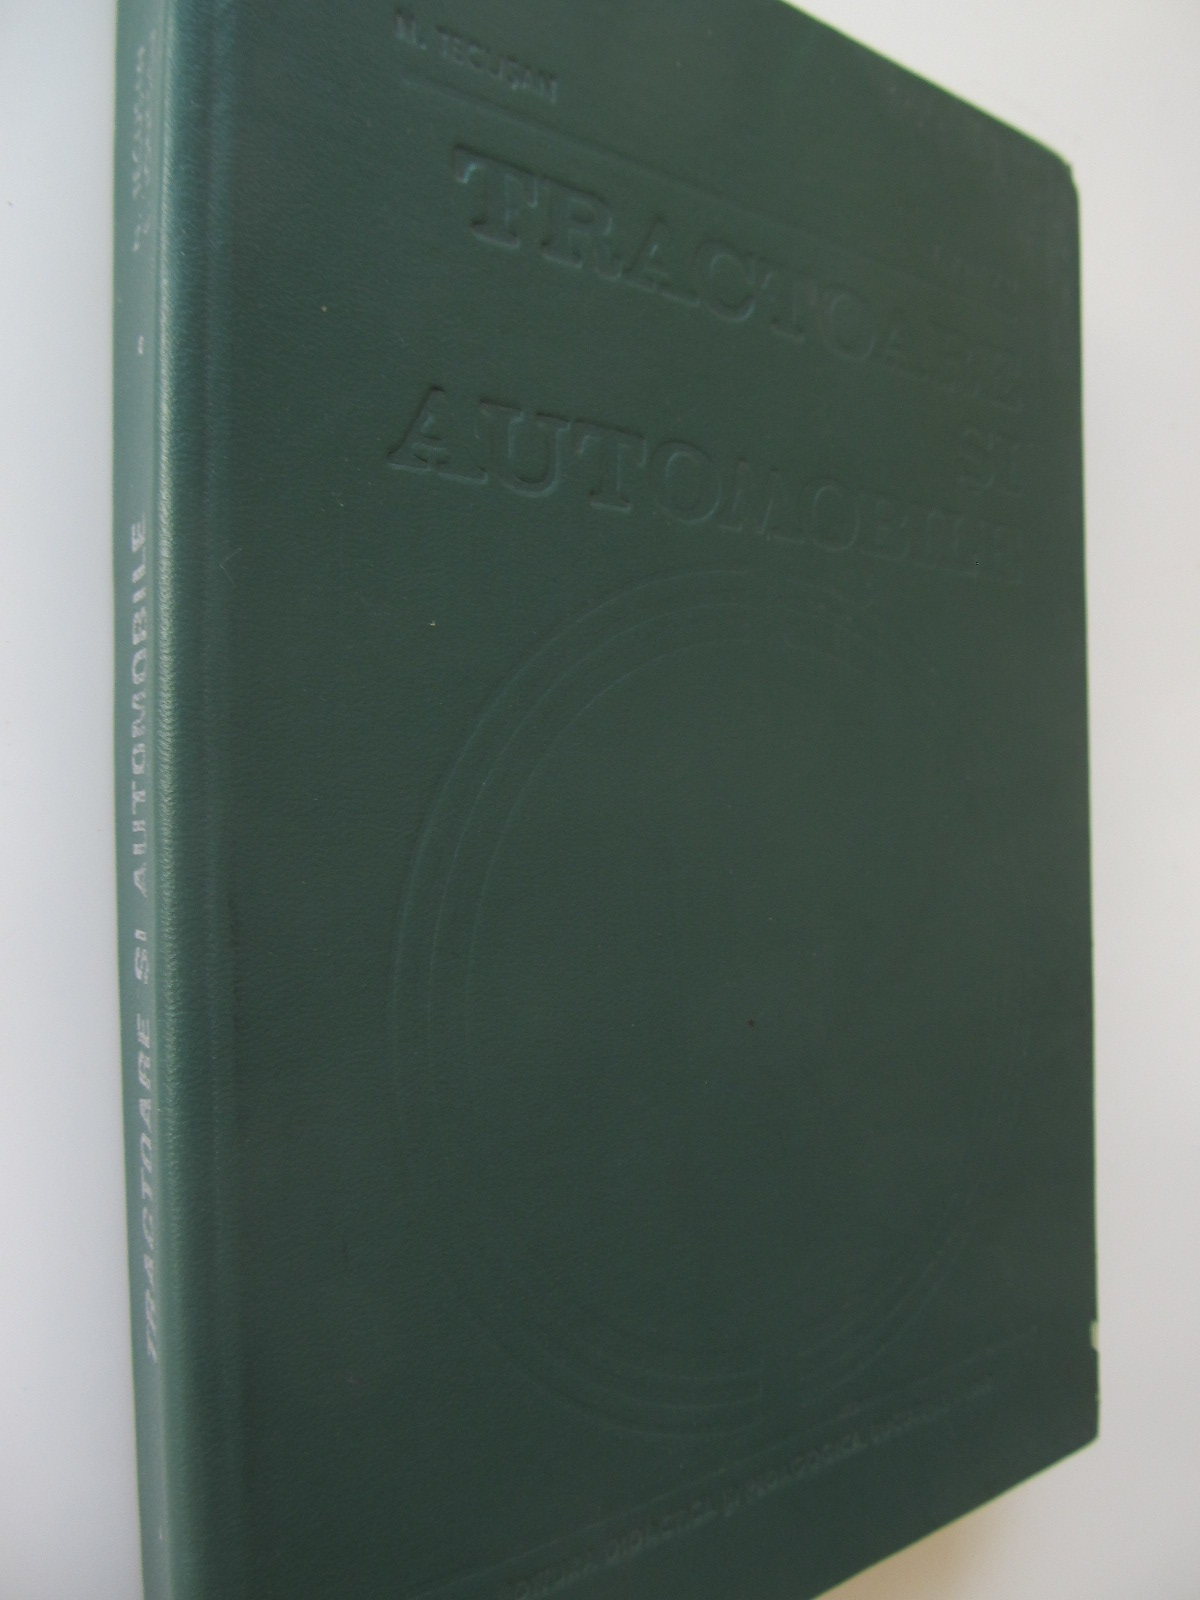 Tractoare si automobile - Nicolae Tecusan , Enache Ionescu | Detalii carte